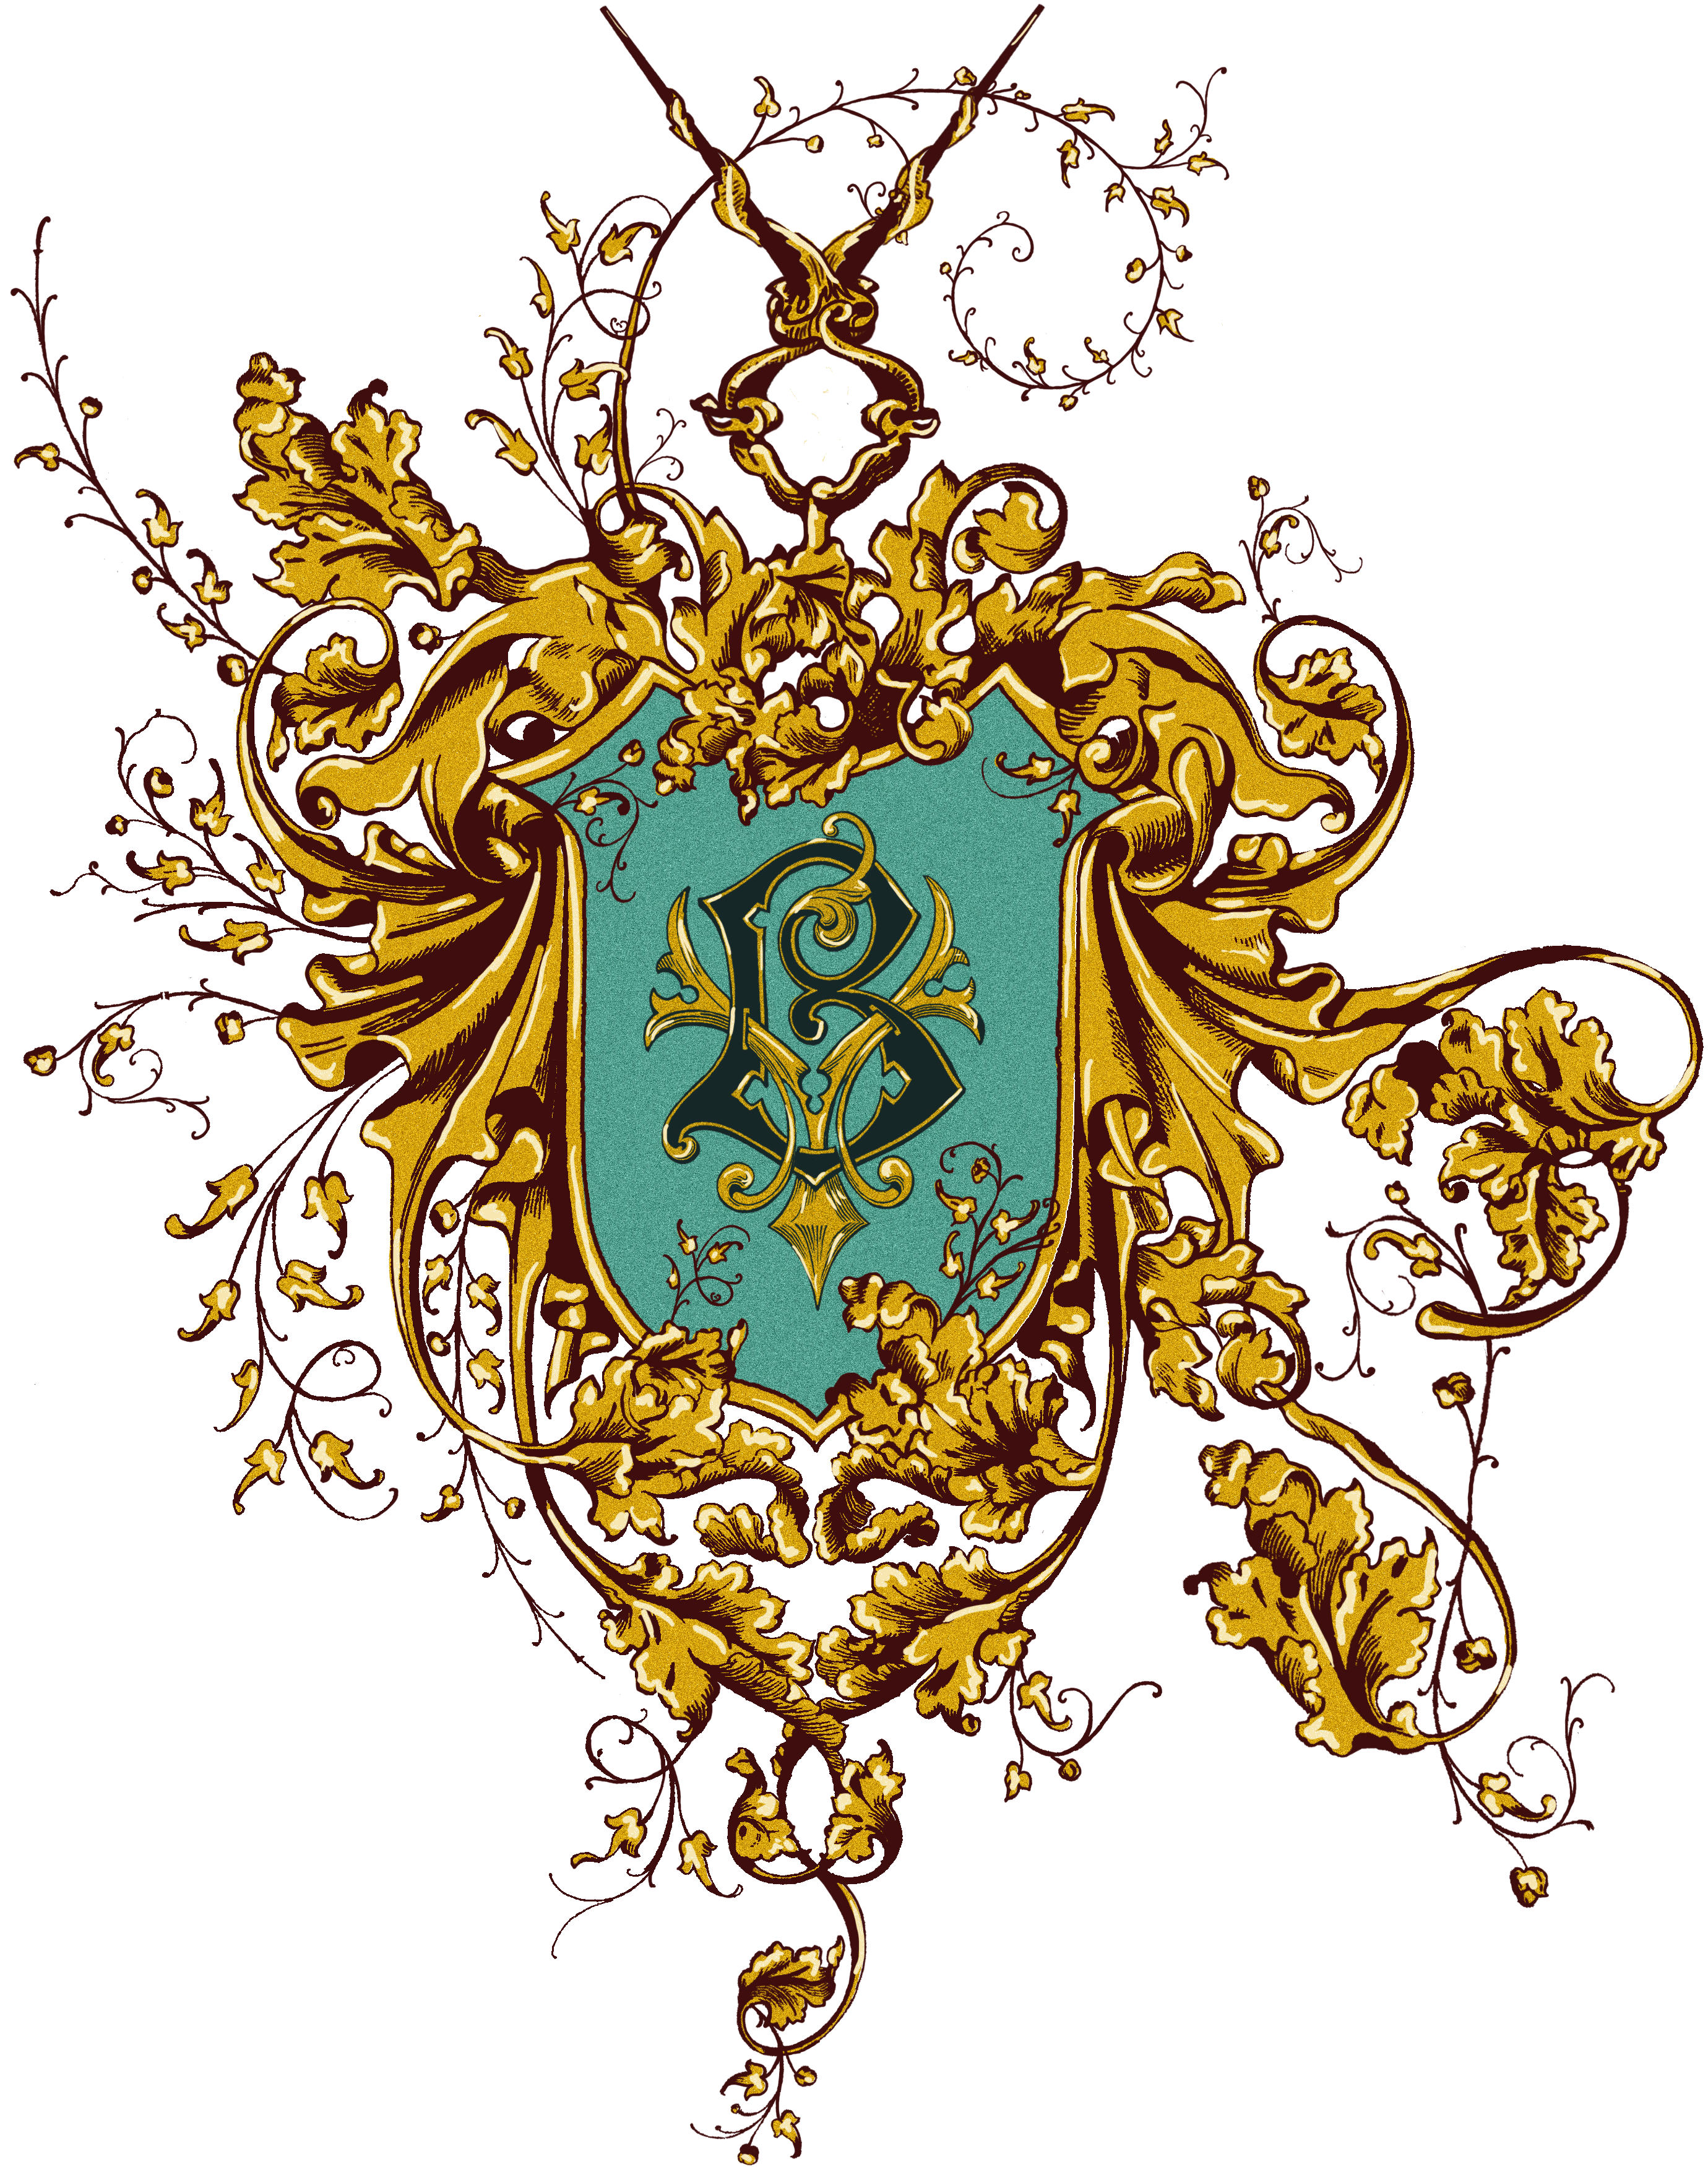 Academia Magica Beauxbatons Harry Potter Wiki Fandom ¿conoces bien beauxbatons, castelobruxo, durmstrang, ilvermorny, mahoutokoro y uagadou? beauxbatons harry potter wiki fandom